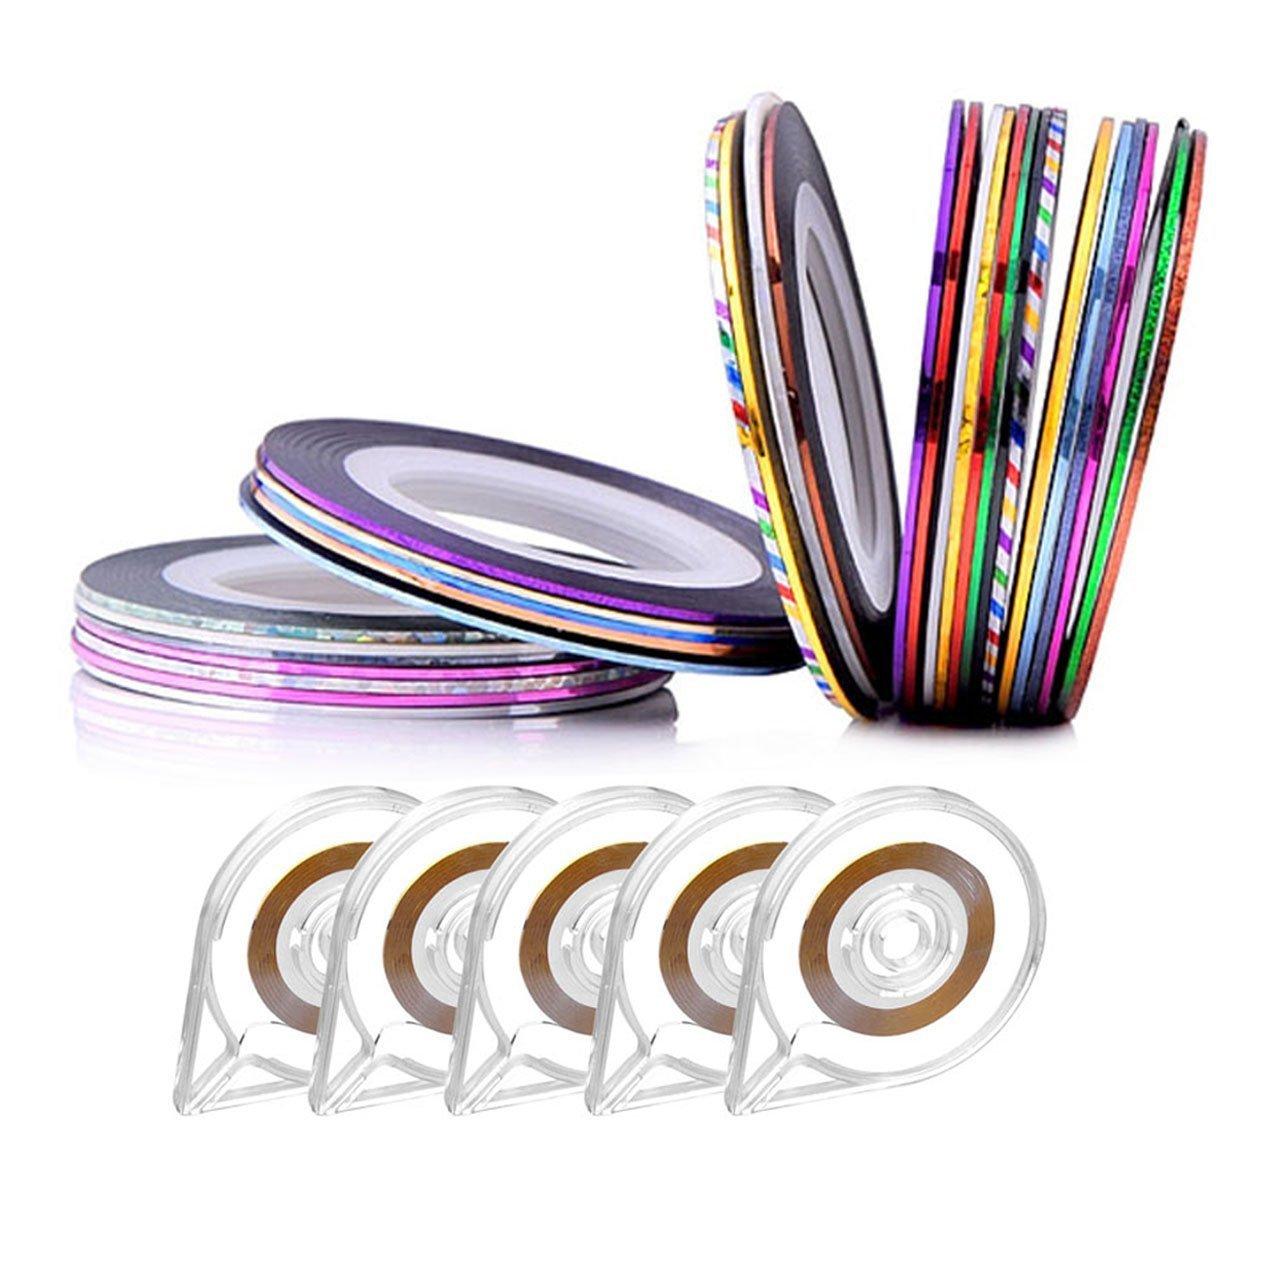 CCbeauty 30 Rolls Mixed Colors Striping Tape Line Nail Art Tips Decoration Sticker + 5Pcs Nail Striping Tape Dispenser Sticker Holder Set by CCbeauty